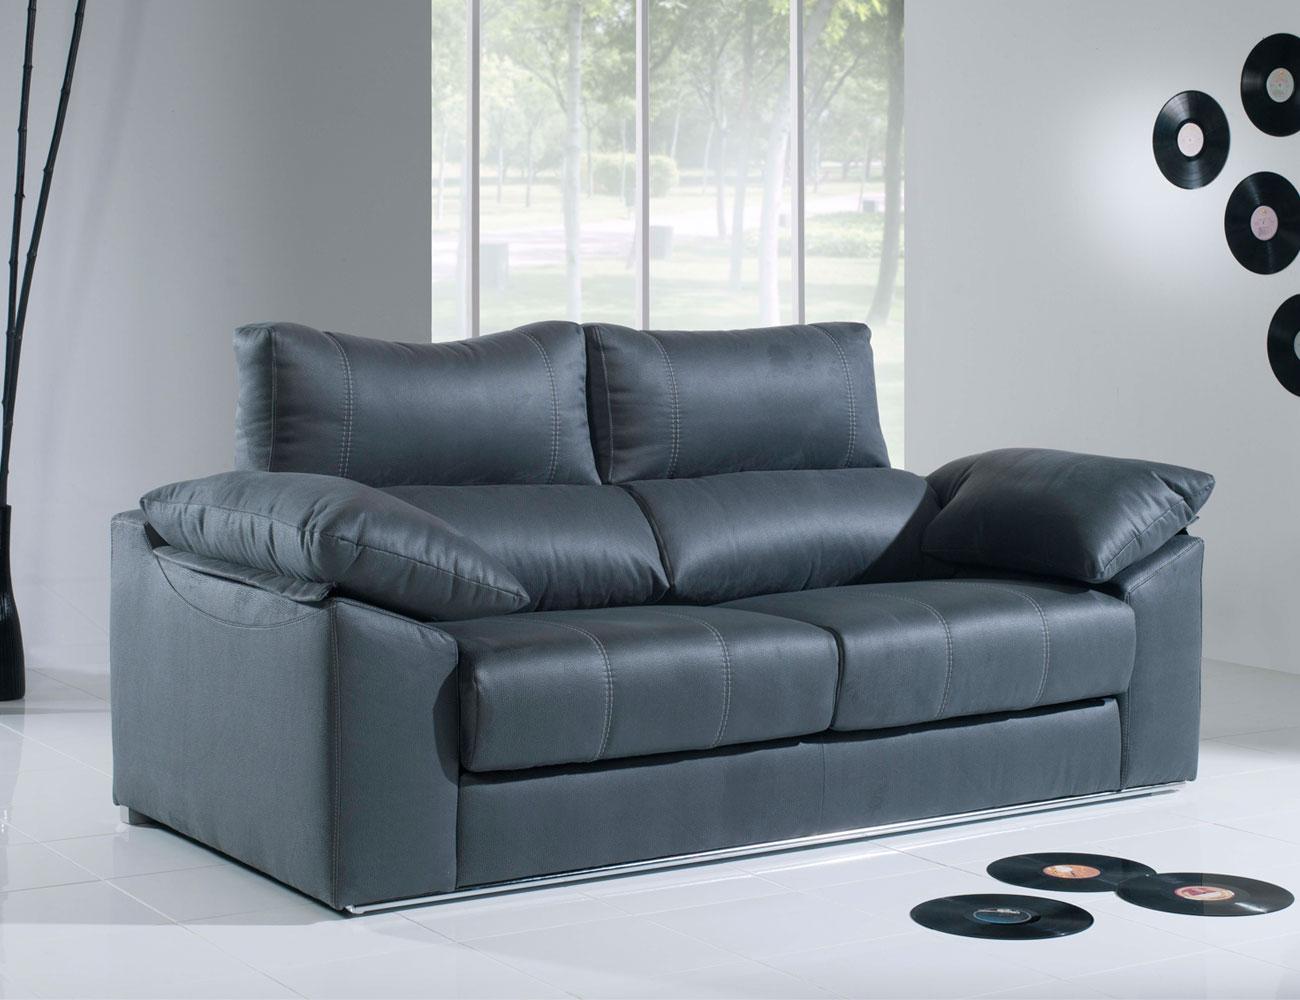 Sof chaiselongue maximo factory del mueble utrera - Factory del sofa sevilla ...